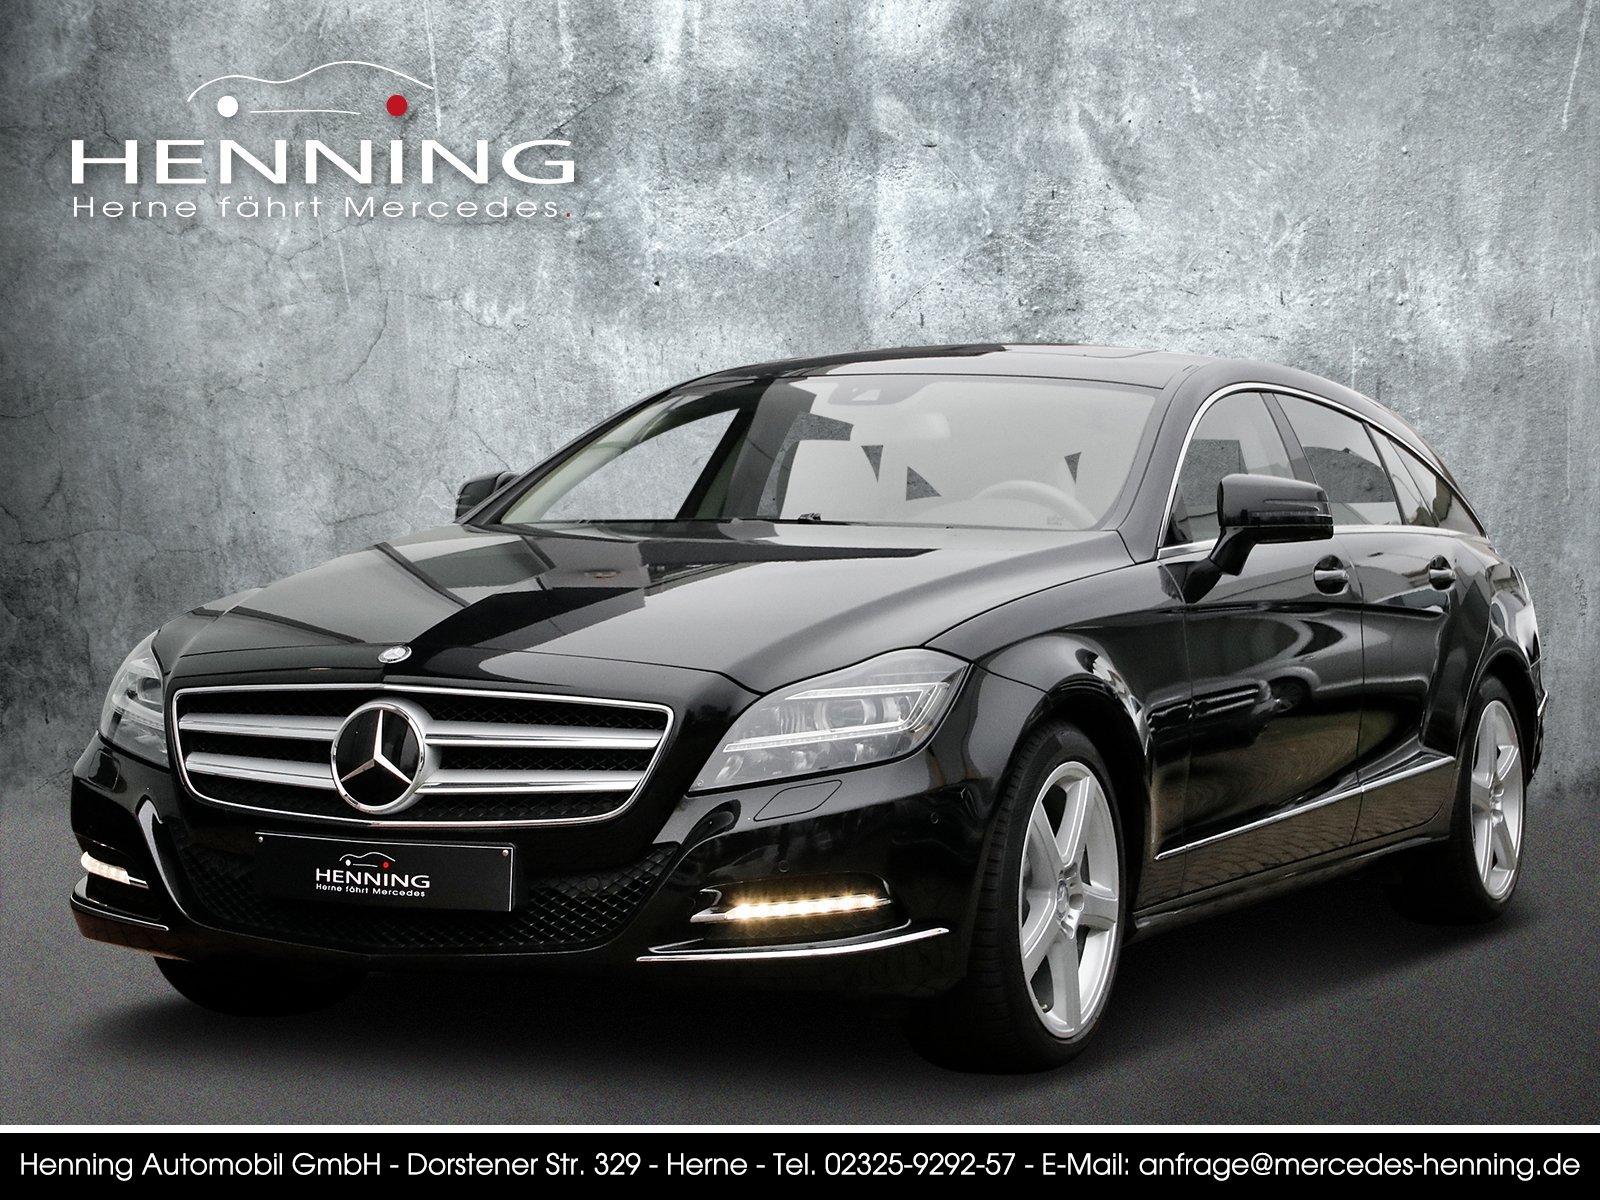 Mercedes-Benz CLS 250 SB COMAND Memory Distronic Burmester AHK, Jahr 2012, diesel